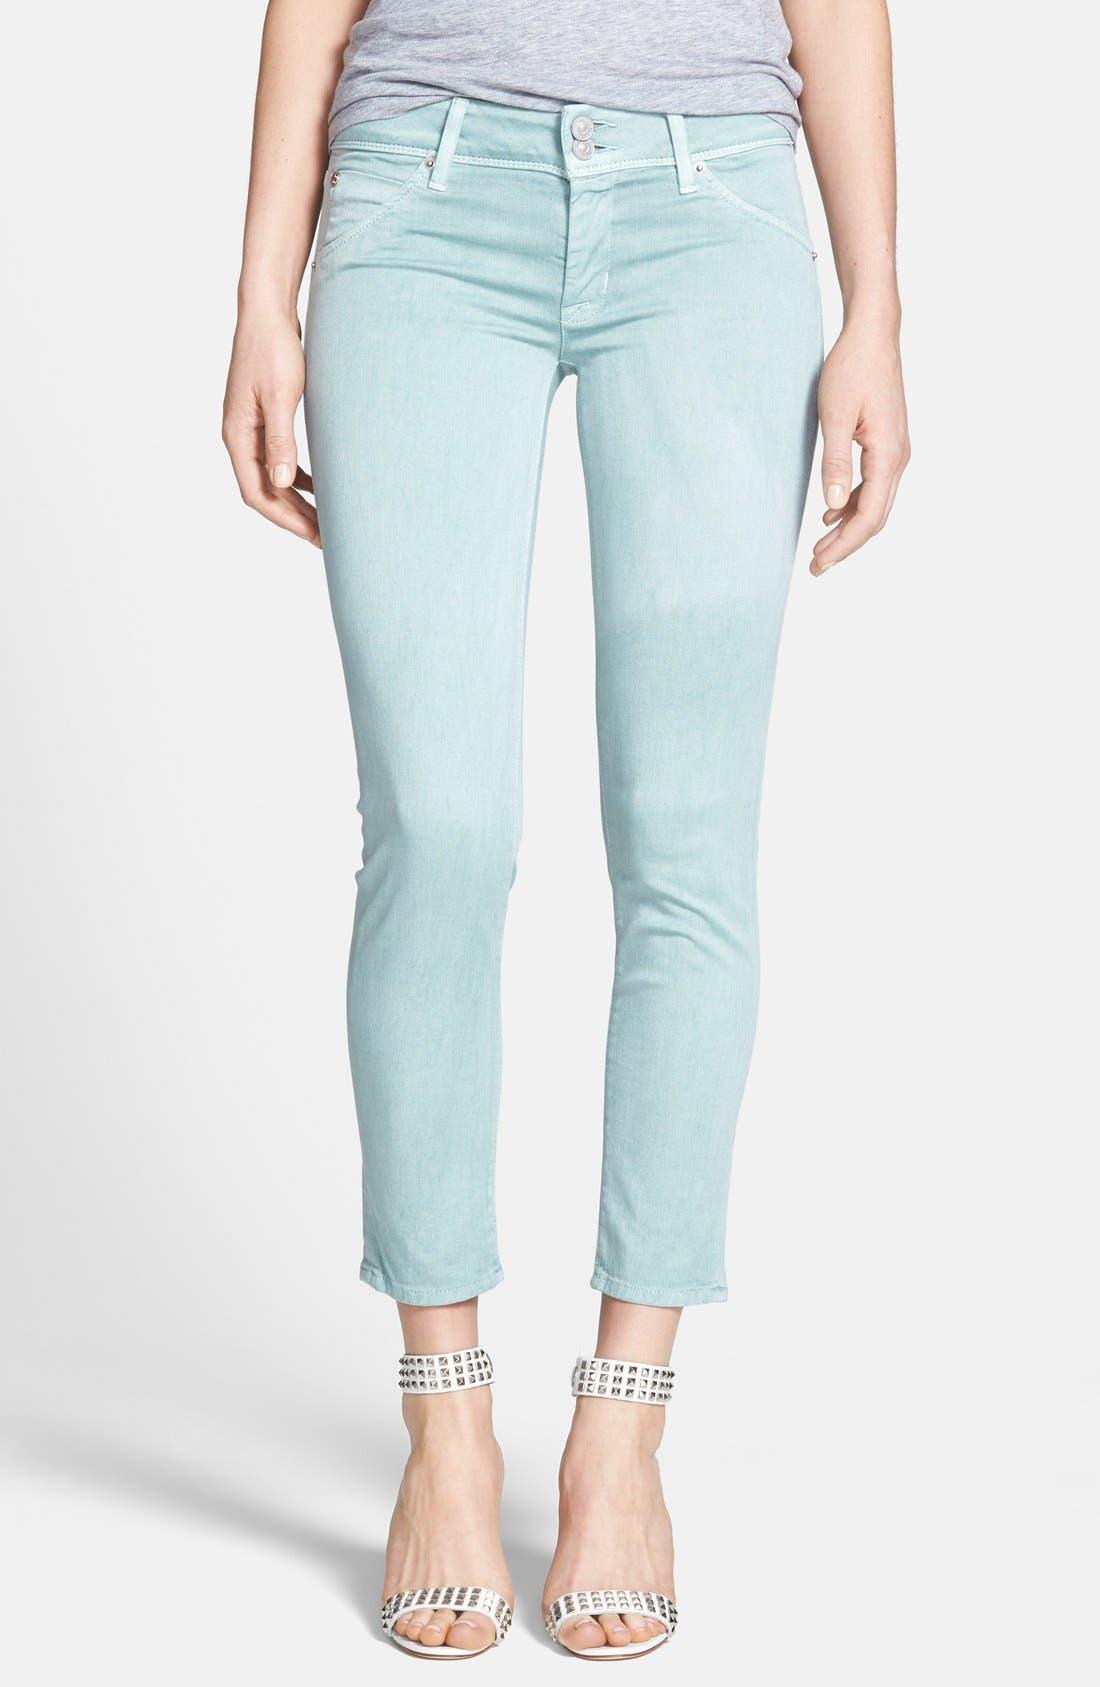 Alternate Image 1 Selected - Hudson Jeans 'Collin' Crop Skinny Jeans (Dusty Pistachio)